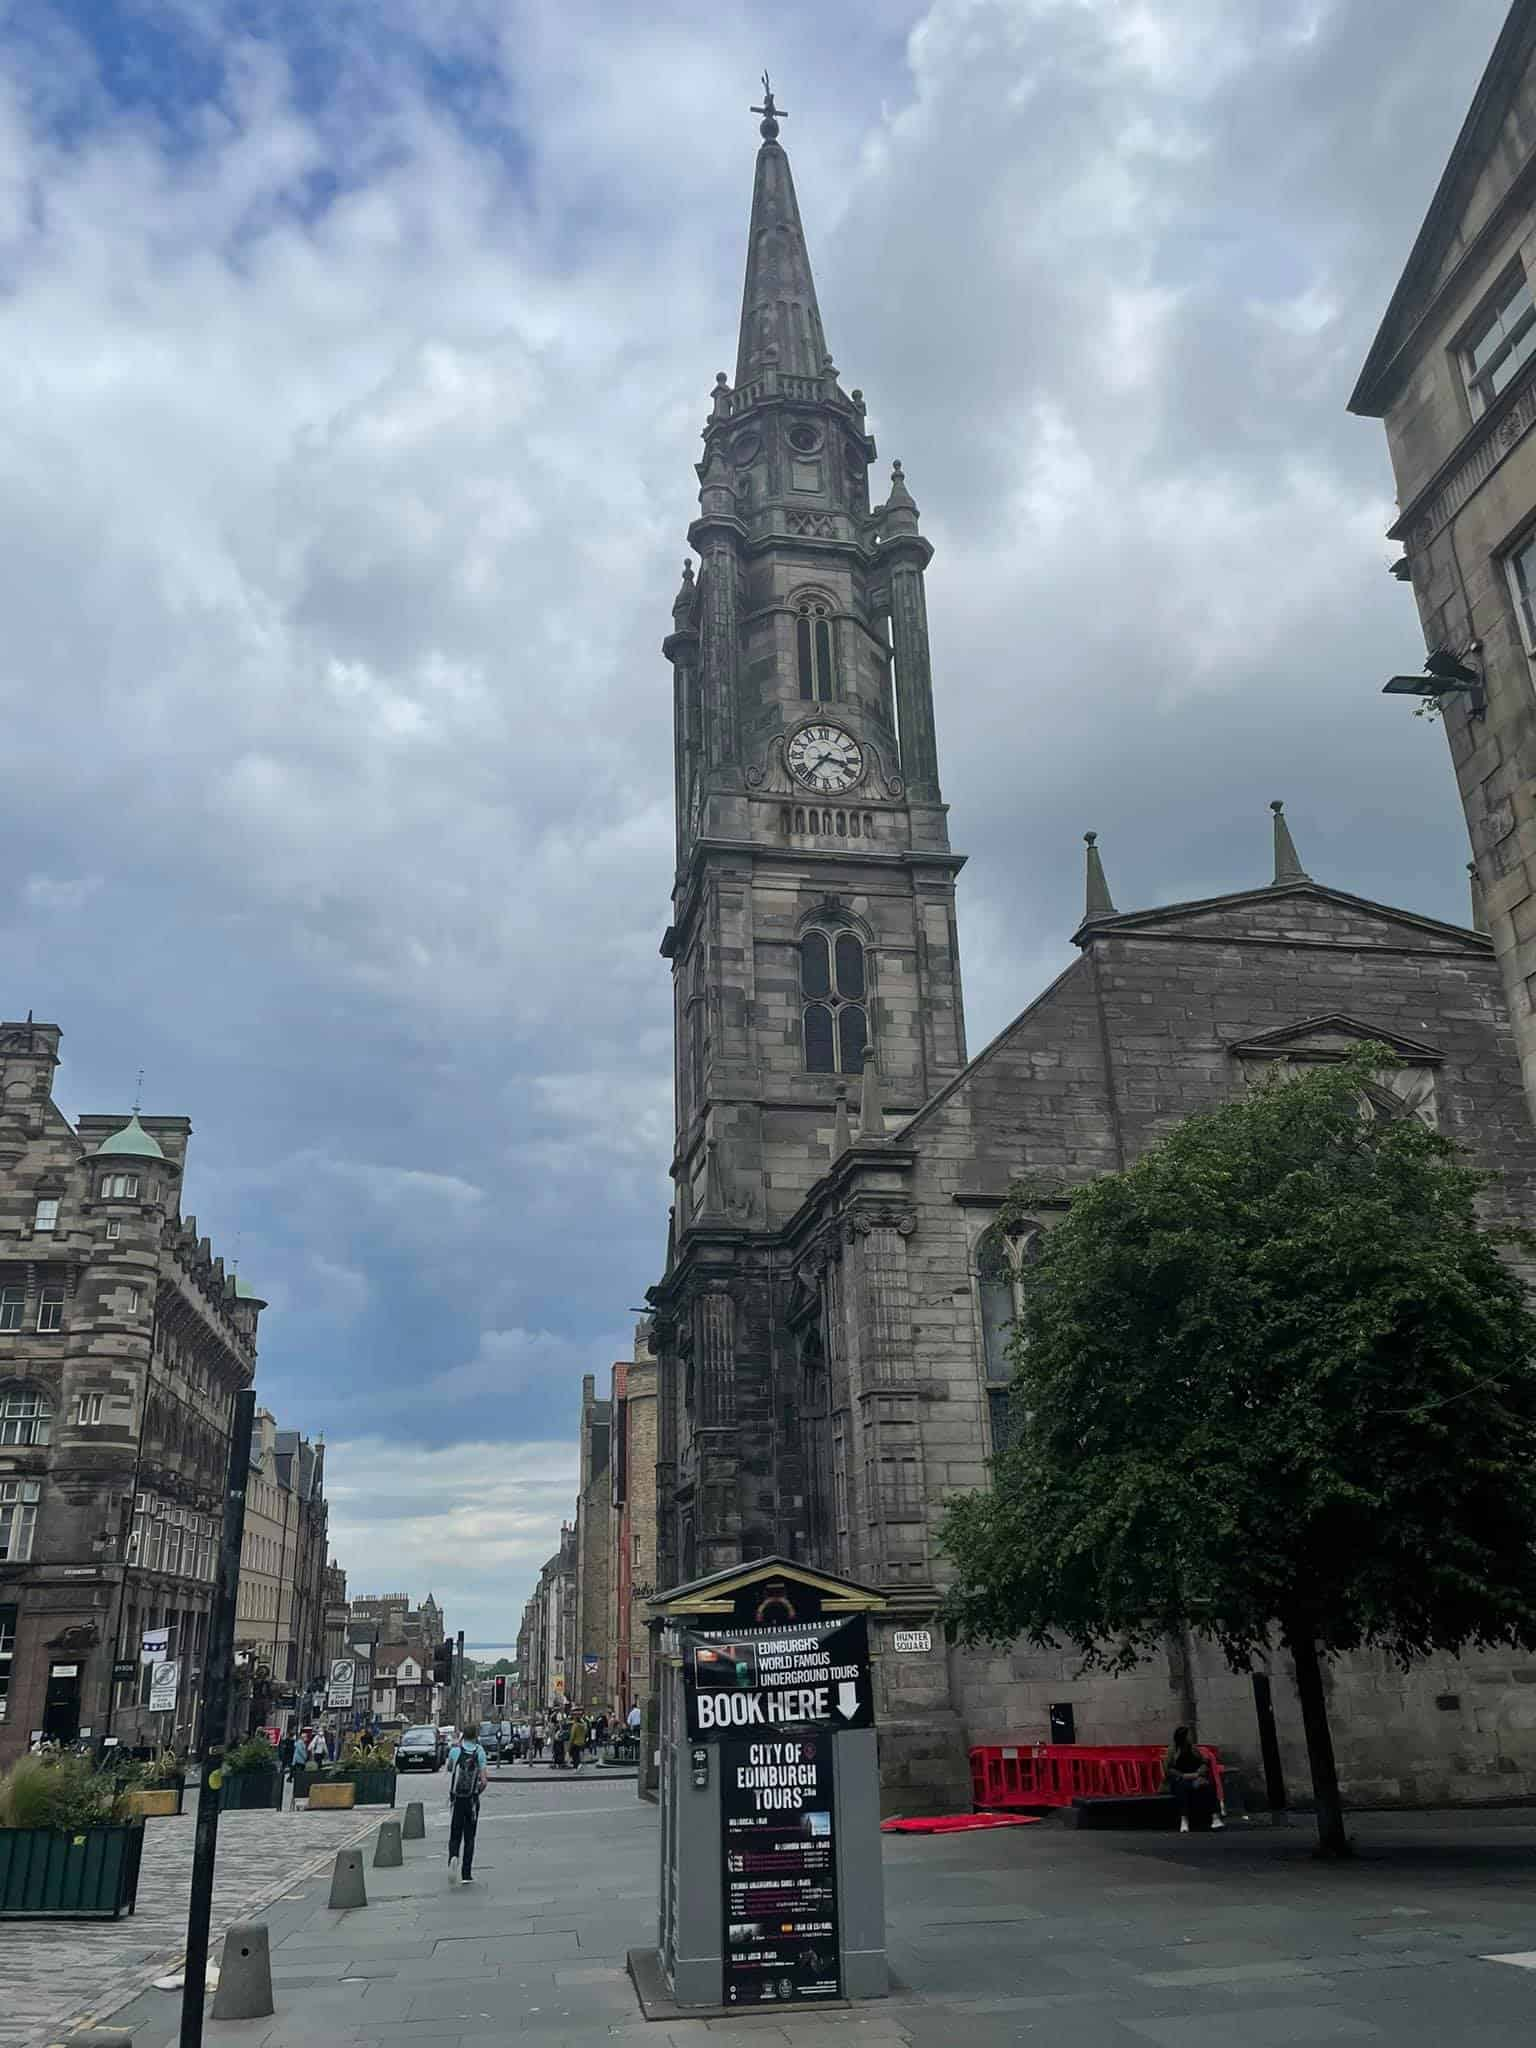 Edinburgh Itinerary: Royal Mile